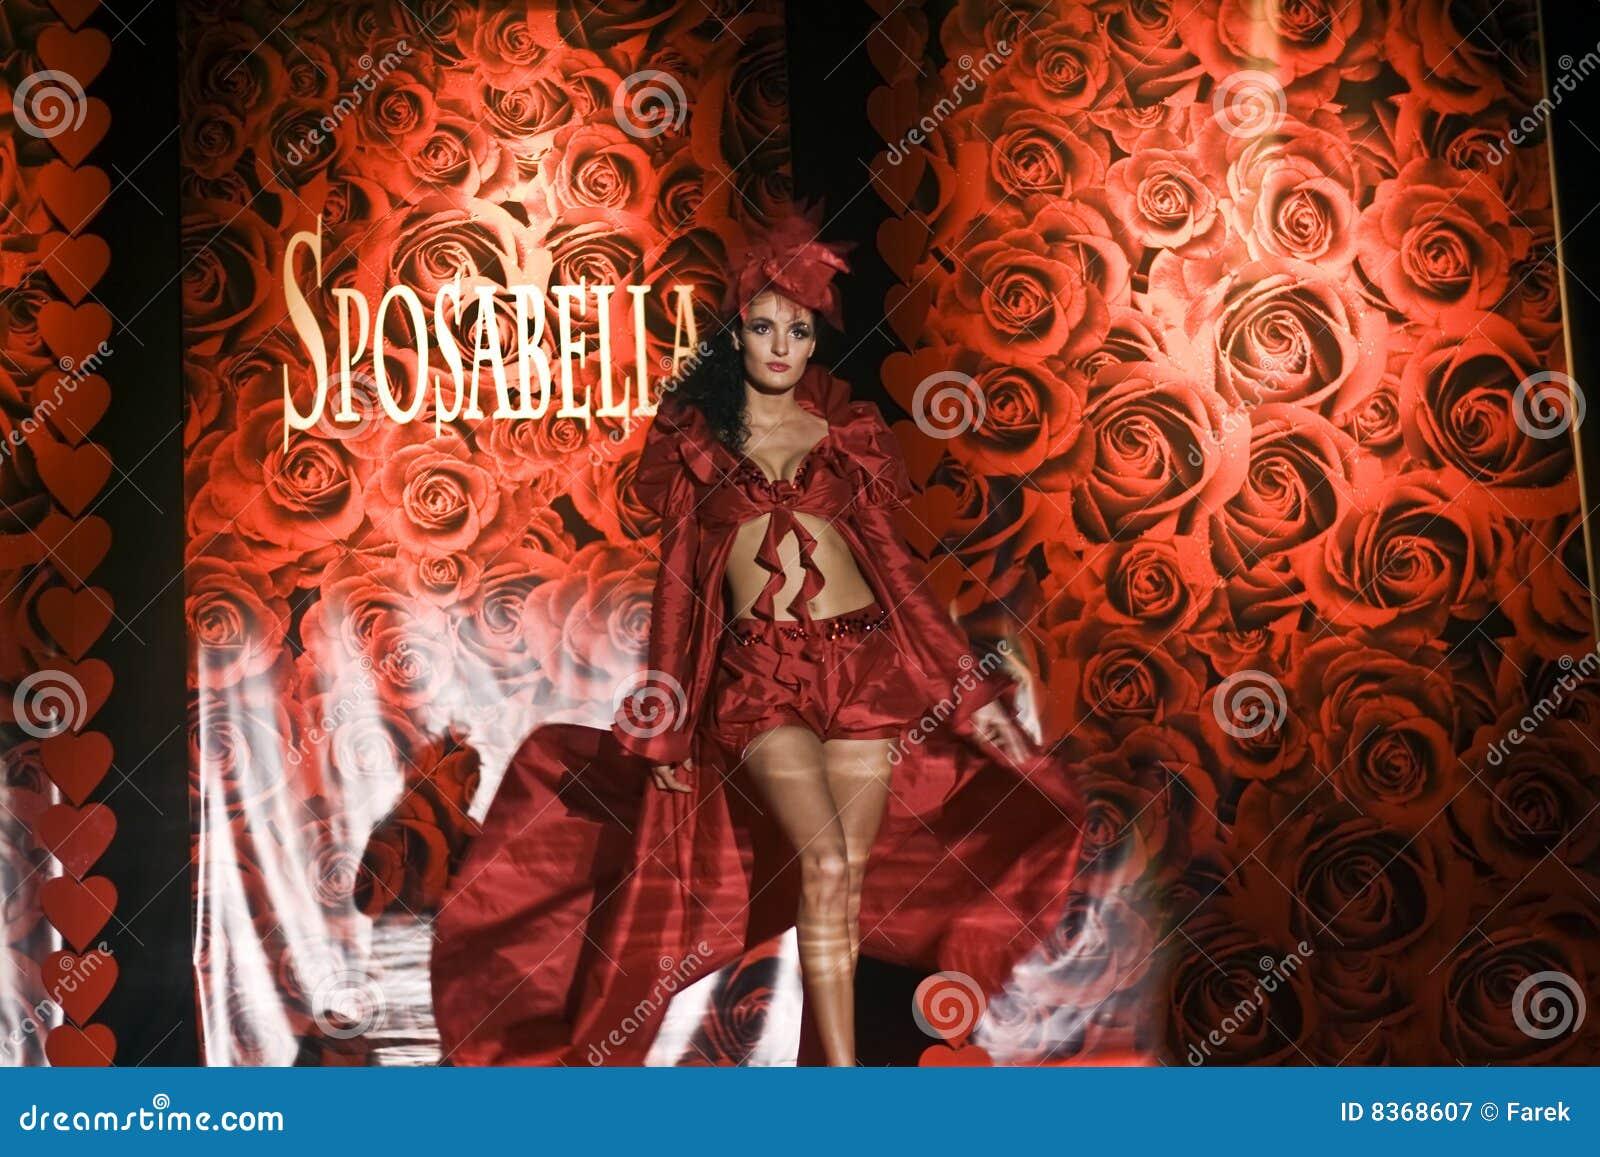 Female model on fashion show